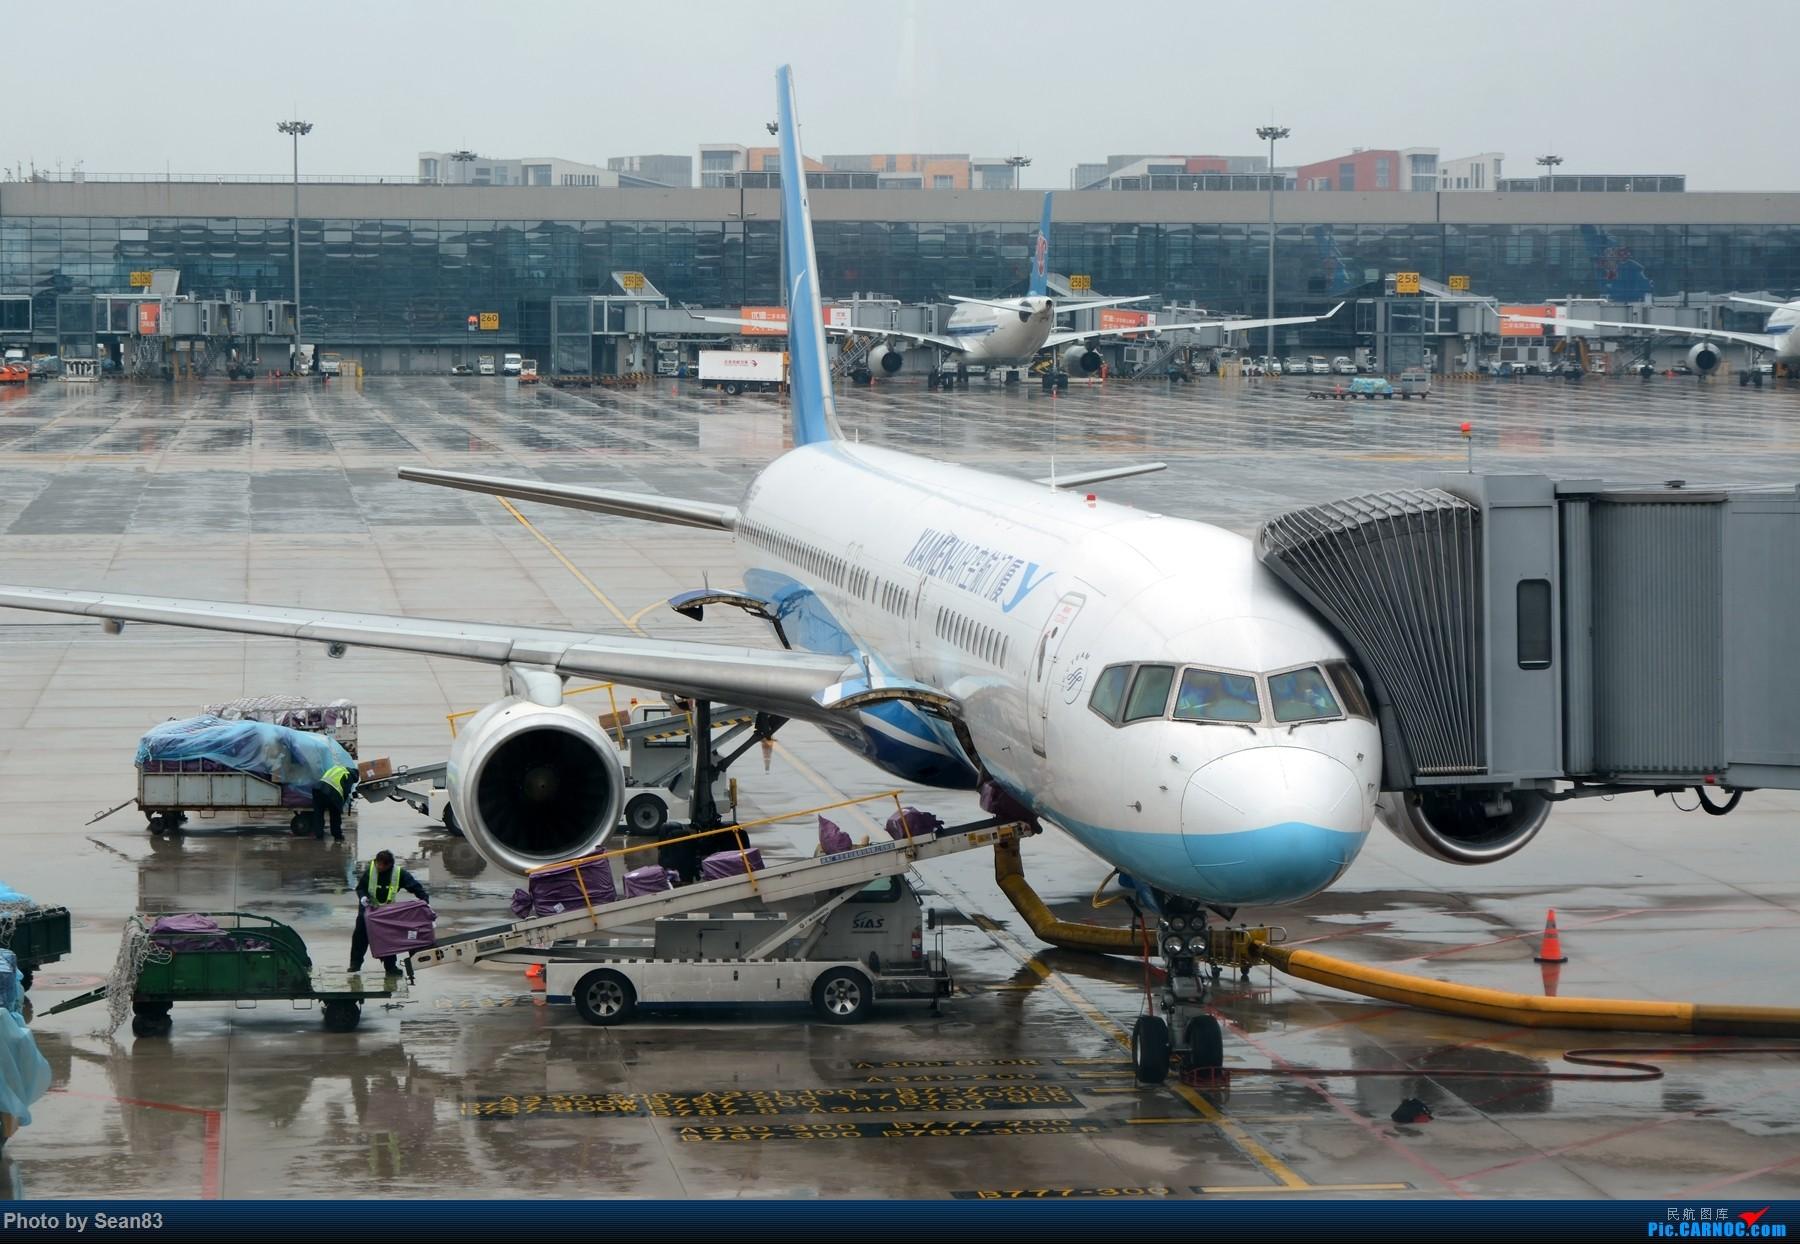 Re:[原创]【仔糕游记20】【白鹭相伴·精彩永随】后会无期,小白鹭波音757·重回MF8115,FOC-PEK·最后一次追寻,再见(文末有彩蛋,已完结) BOEING 757-200 B-2868 中国上海虹桥国际机场